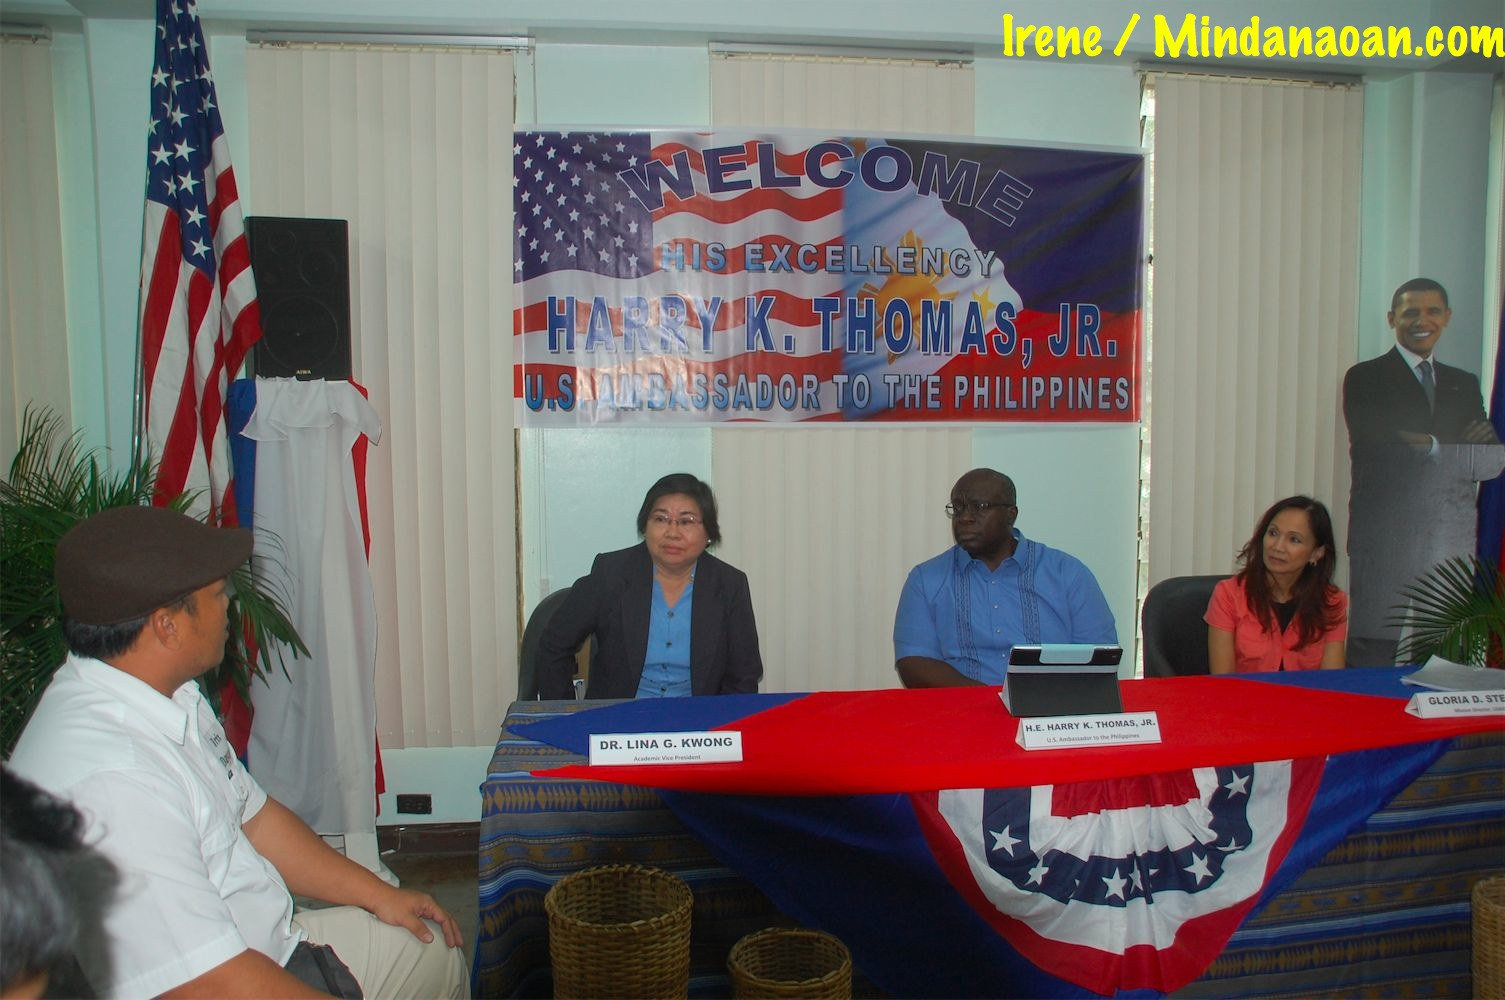 US Ambassador Harry Thomas, Jr. meets with Mindanaoan youth leaders